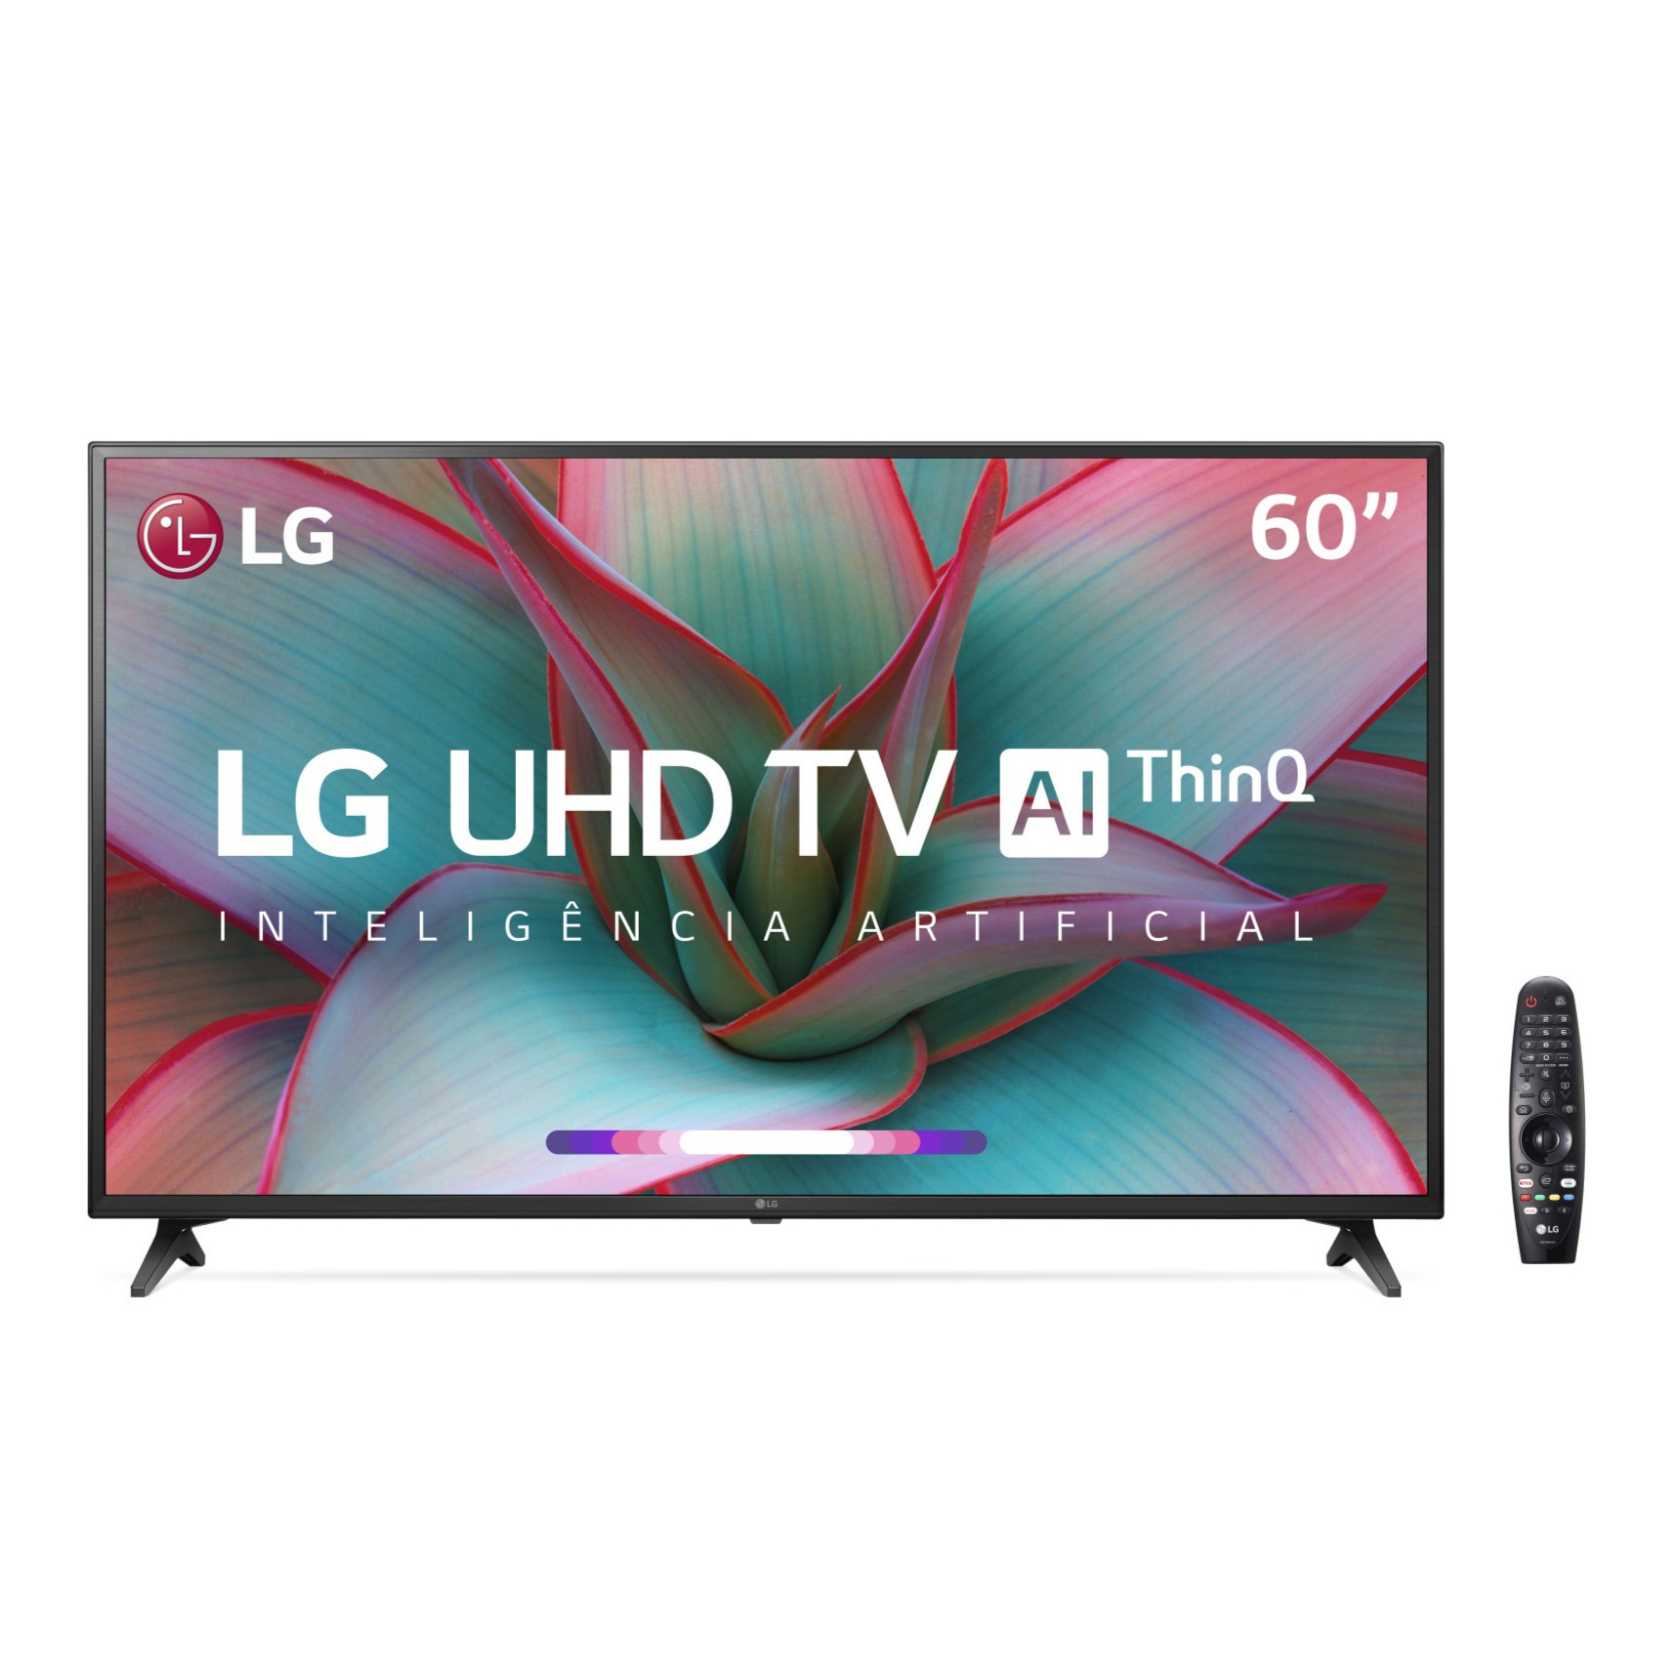 Smart TV LG 60 4K UHD 60UN7310 WiFi Bluetooth HDR Inteligencia Artificial ThinQ Smart Magic Google Alexa